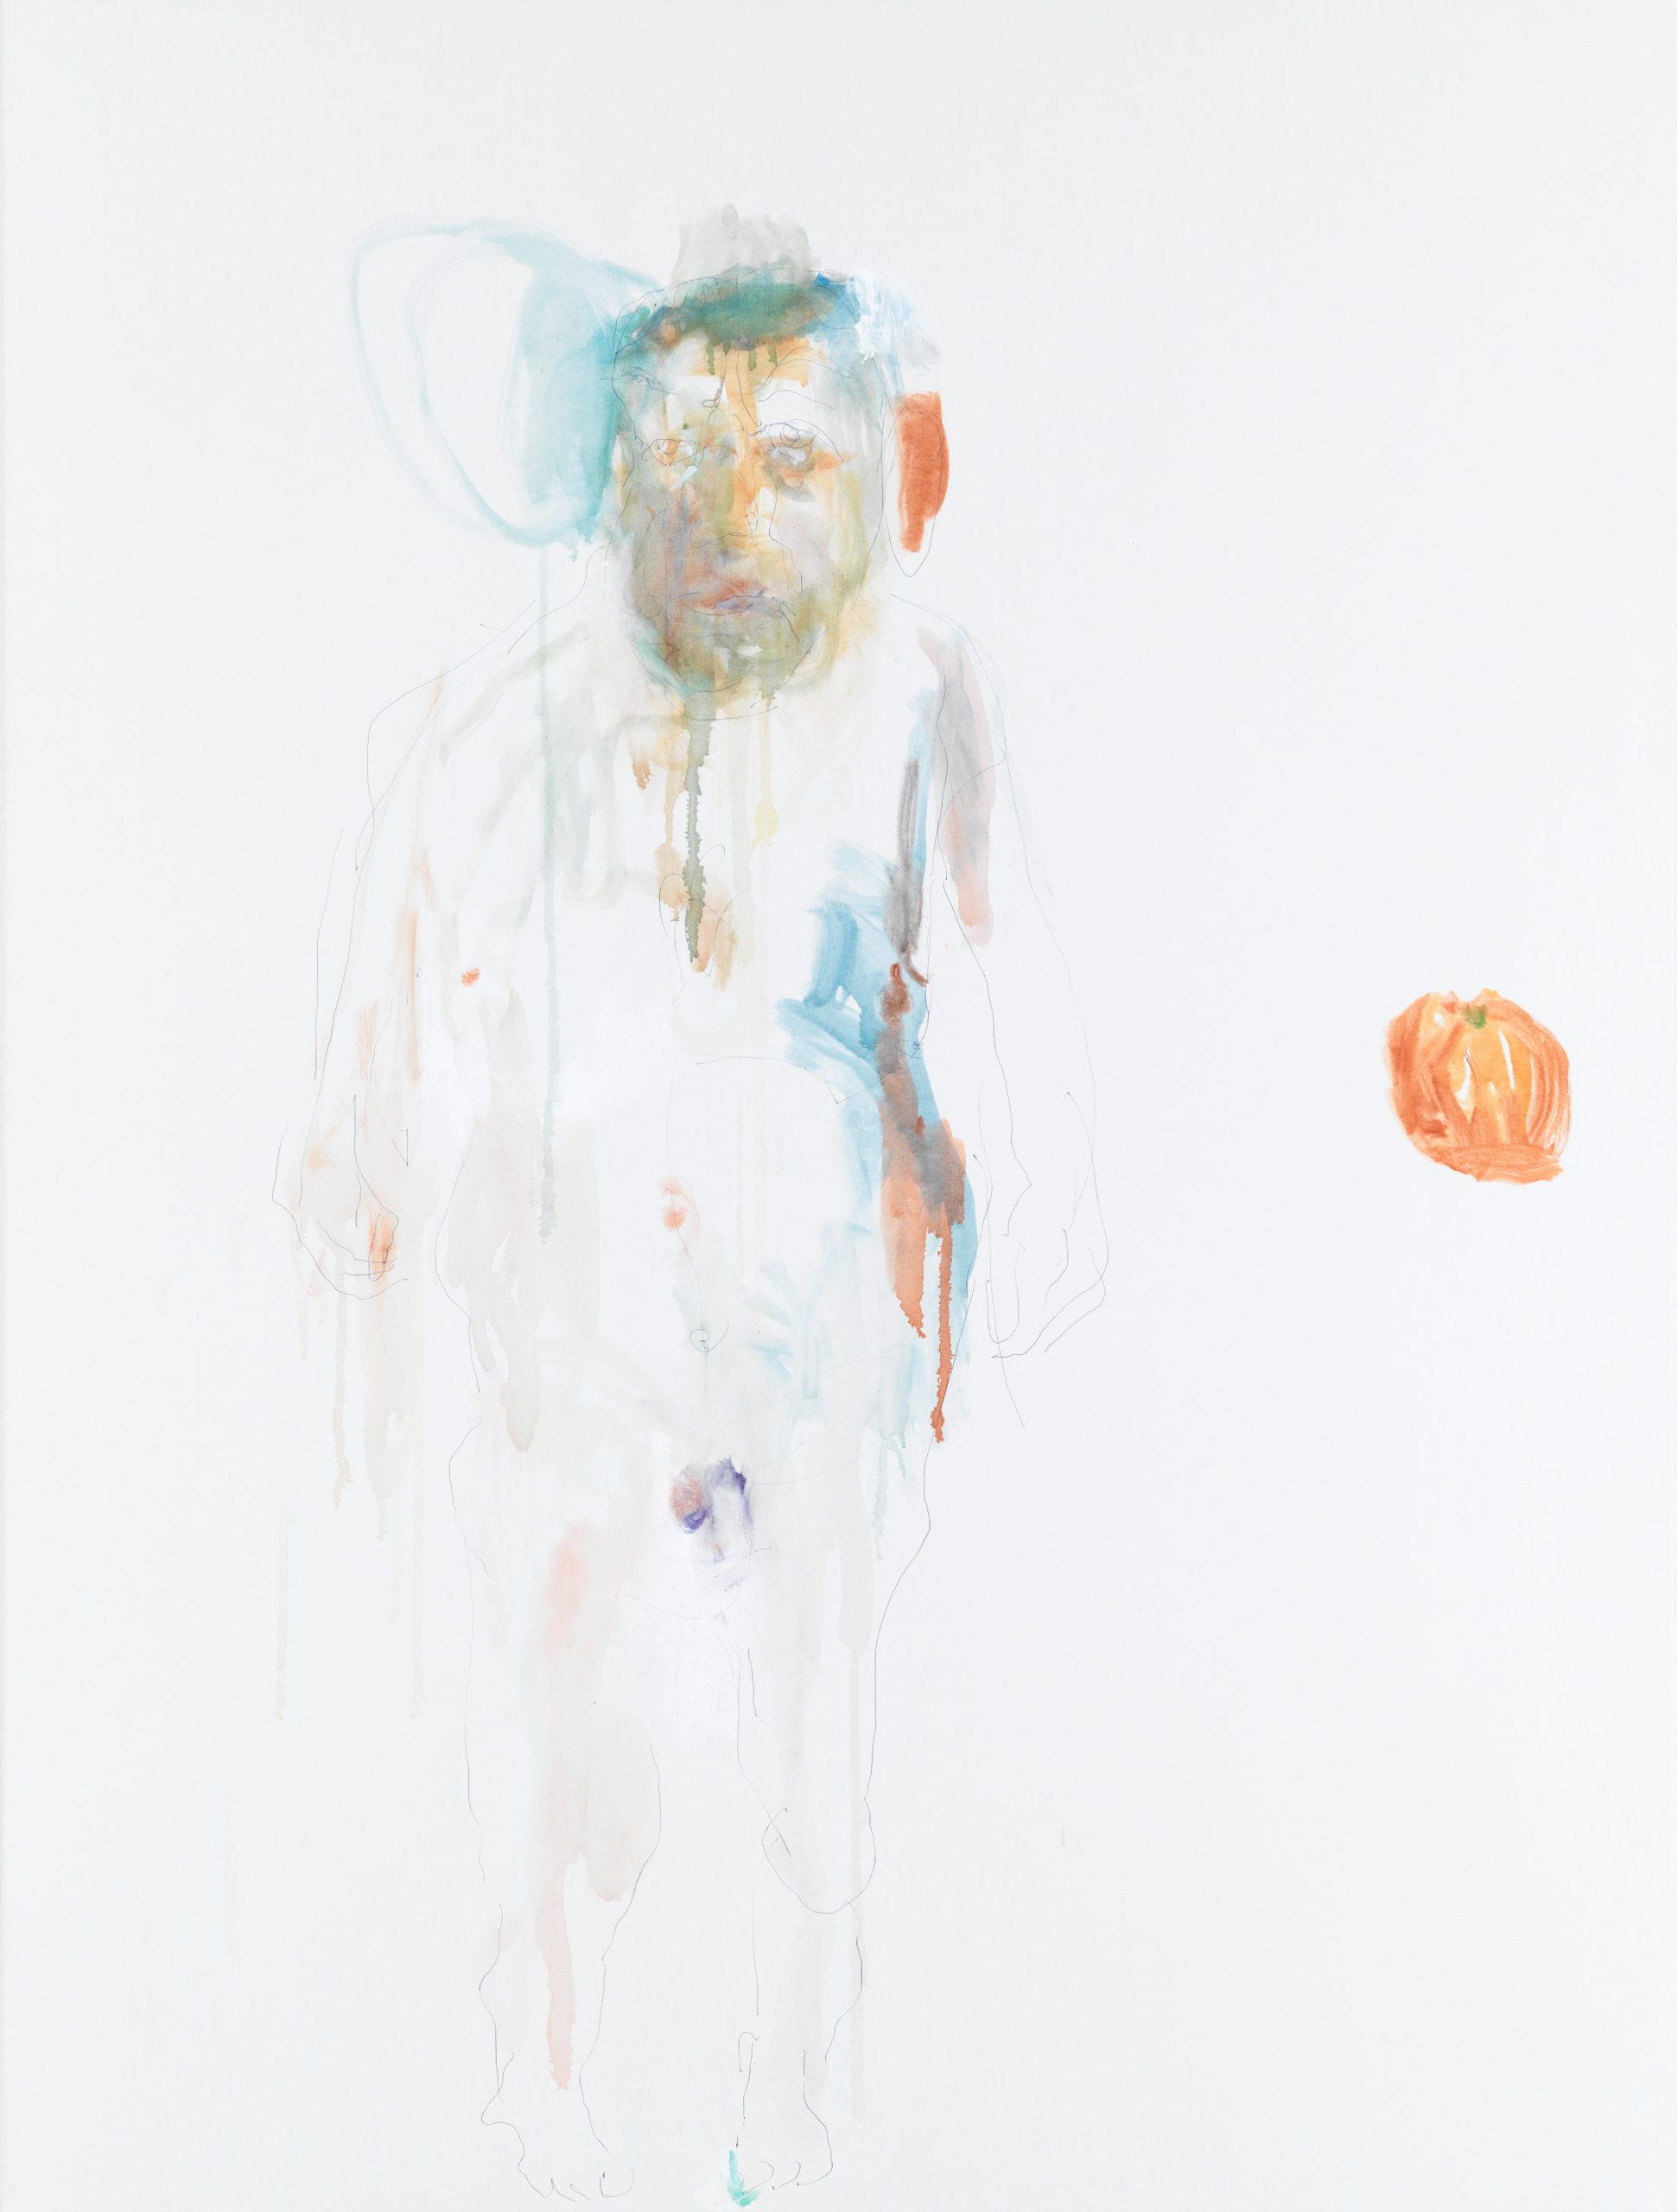 Reinhard Pods, Untitled (selbst), 2021, biro, watercolour on canvas, 170 x 129.8 cm